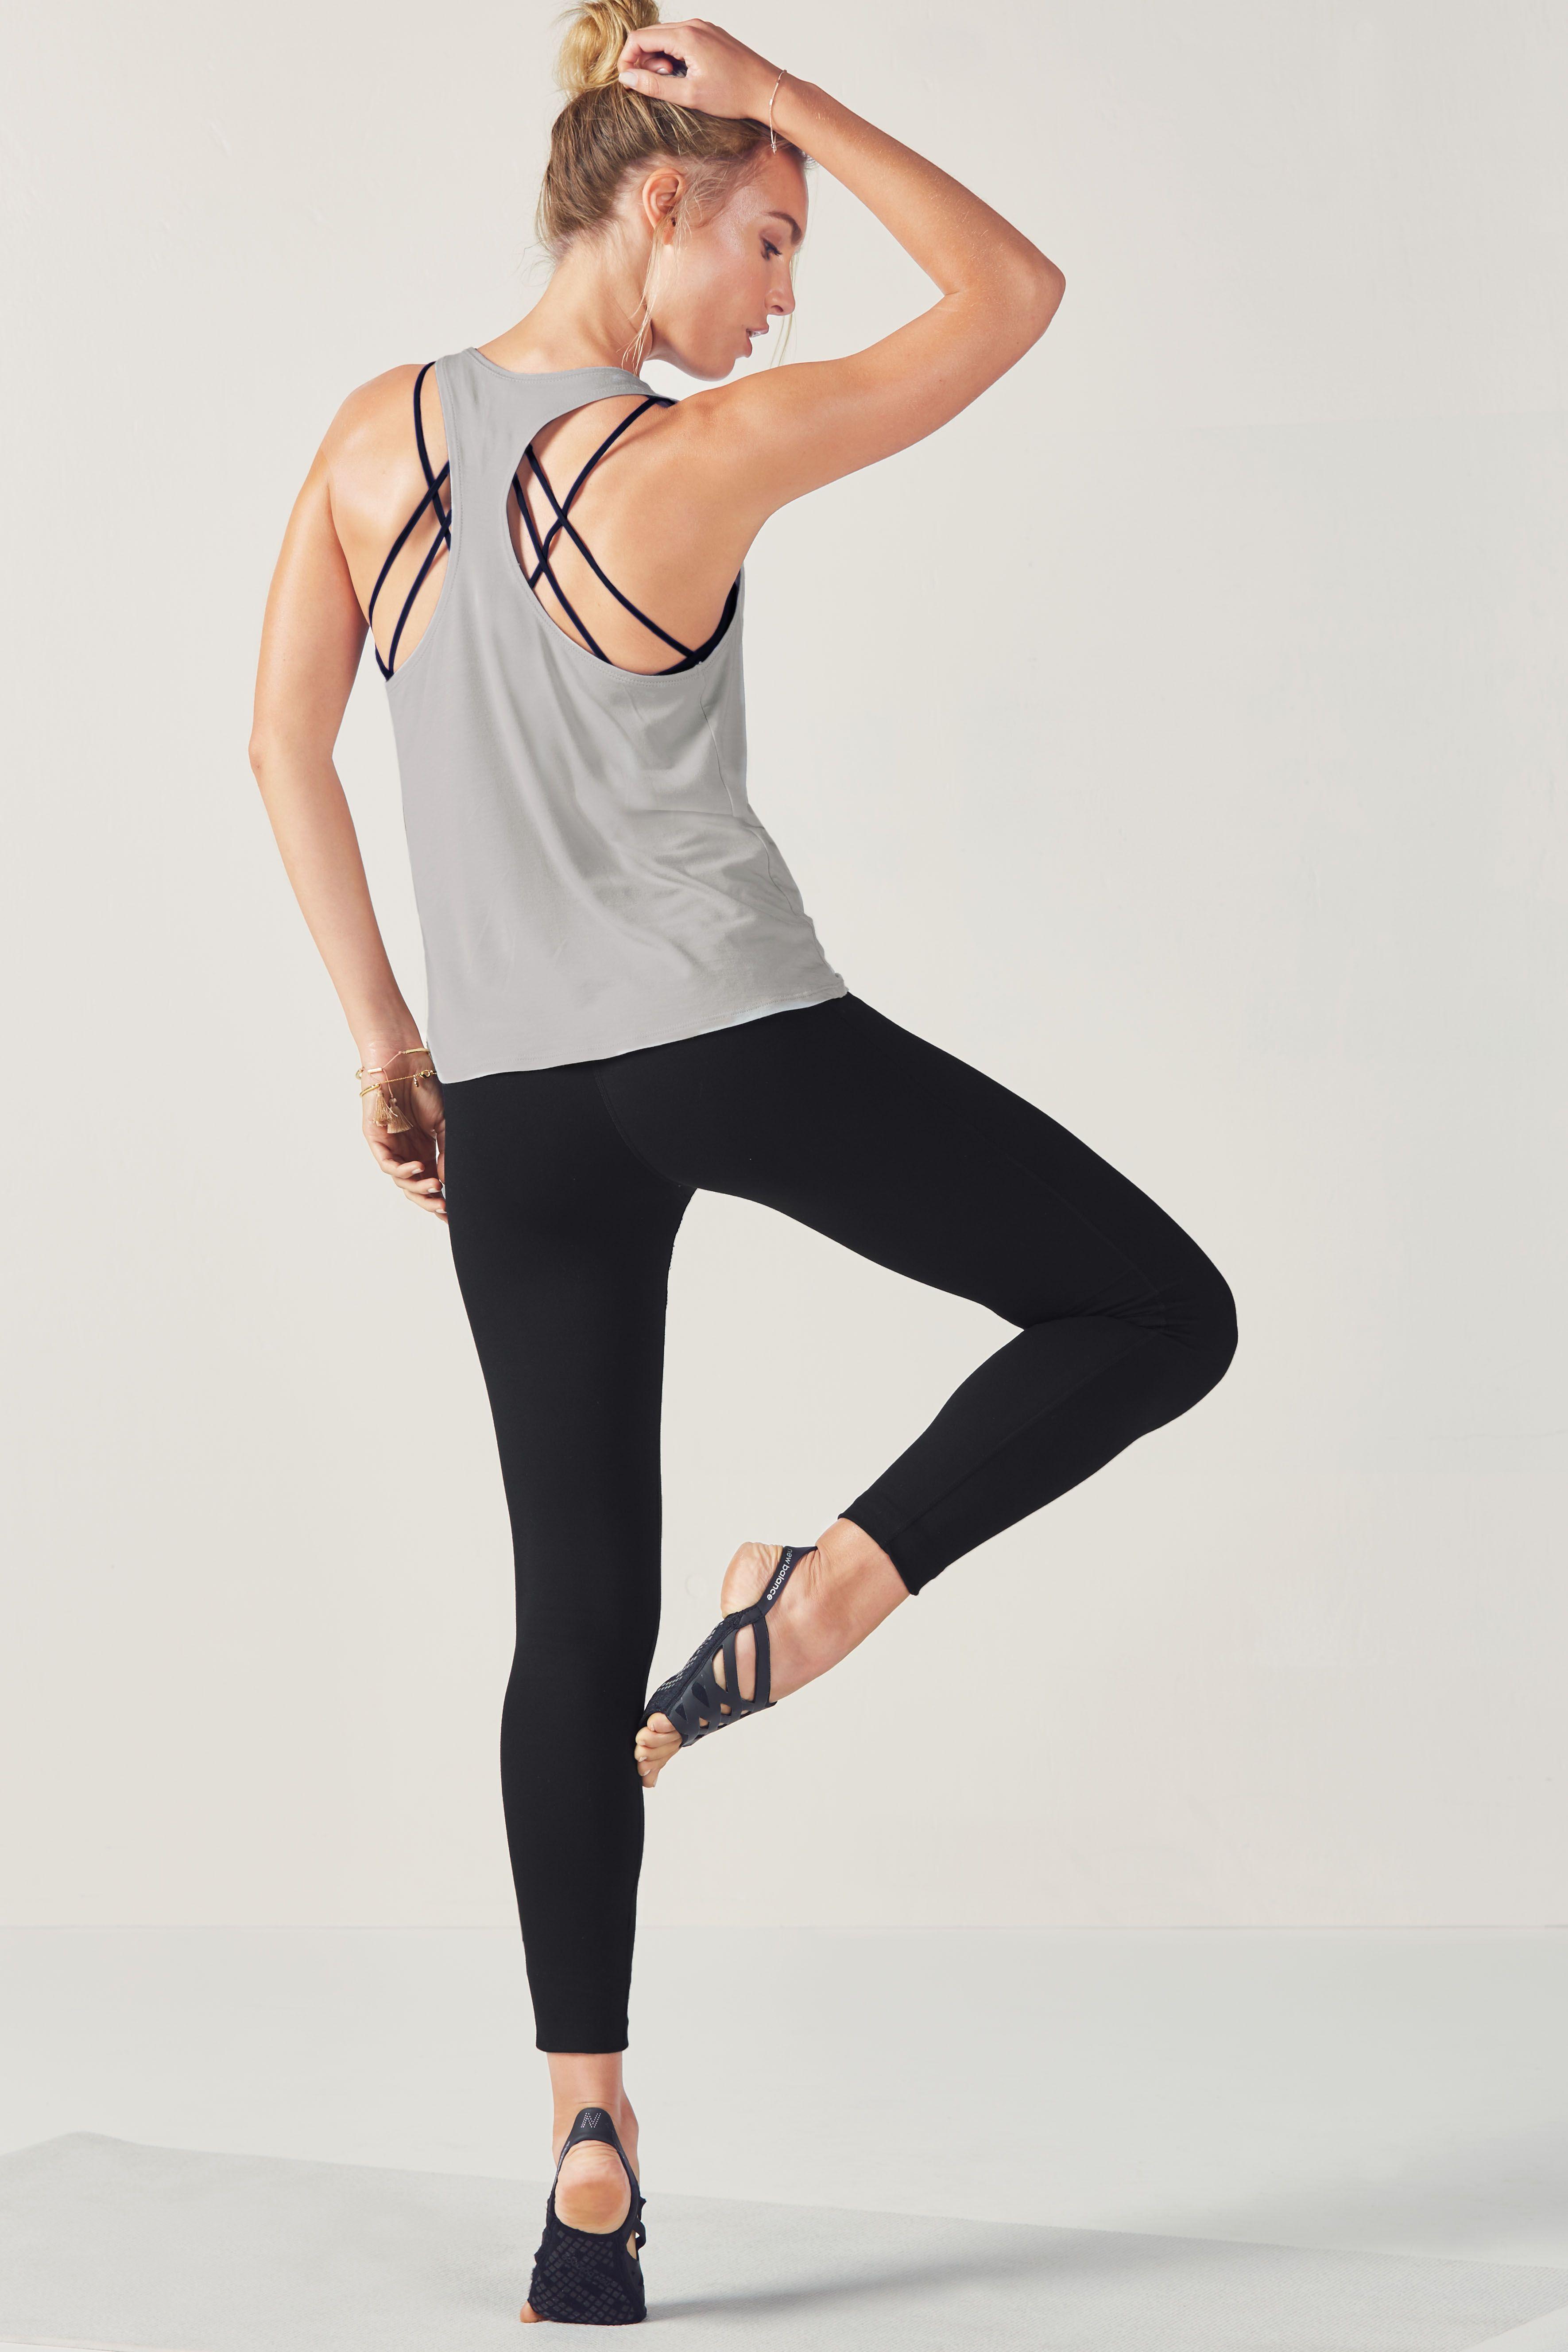 Gracelyn - Fabletics FitnessApparelExpress.com ♡ Women s Workout Clothes  b18769627535a